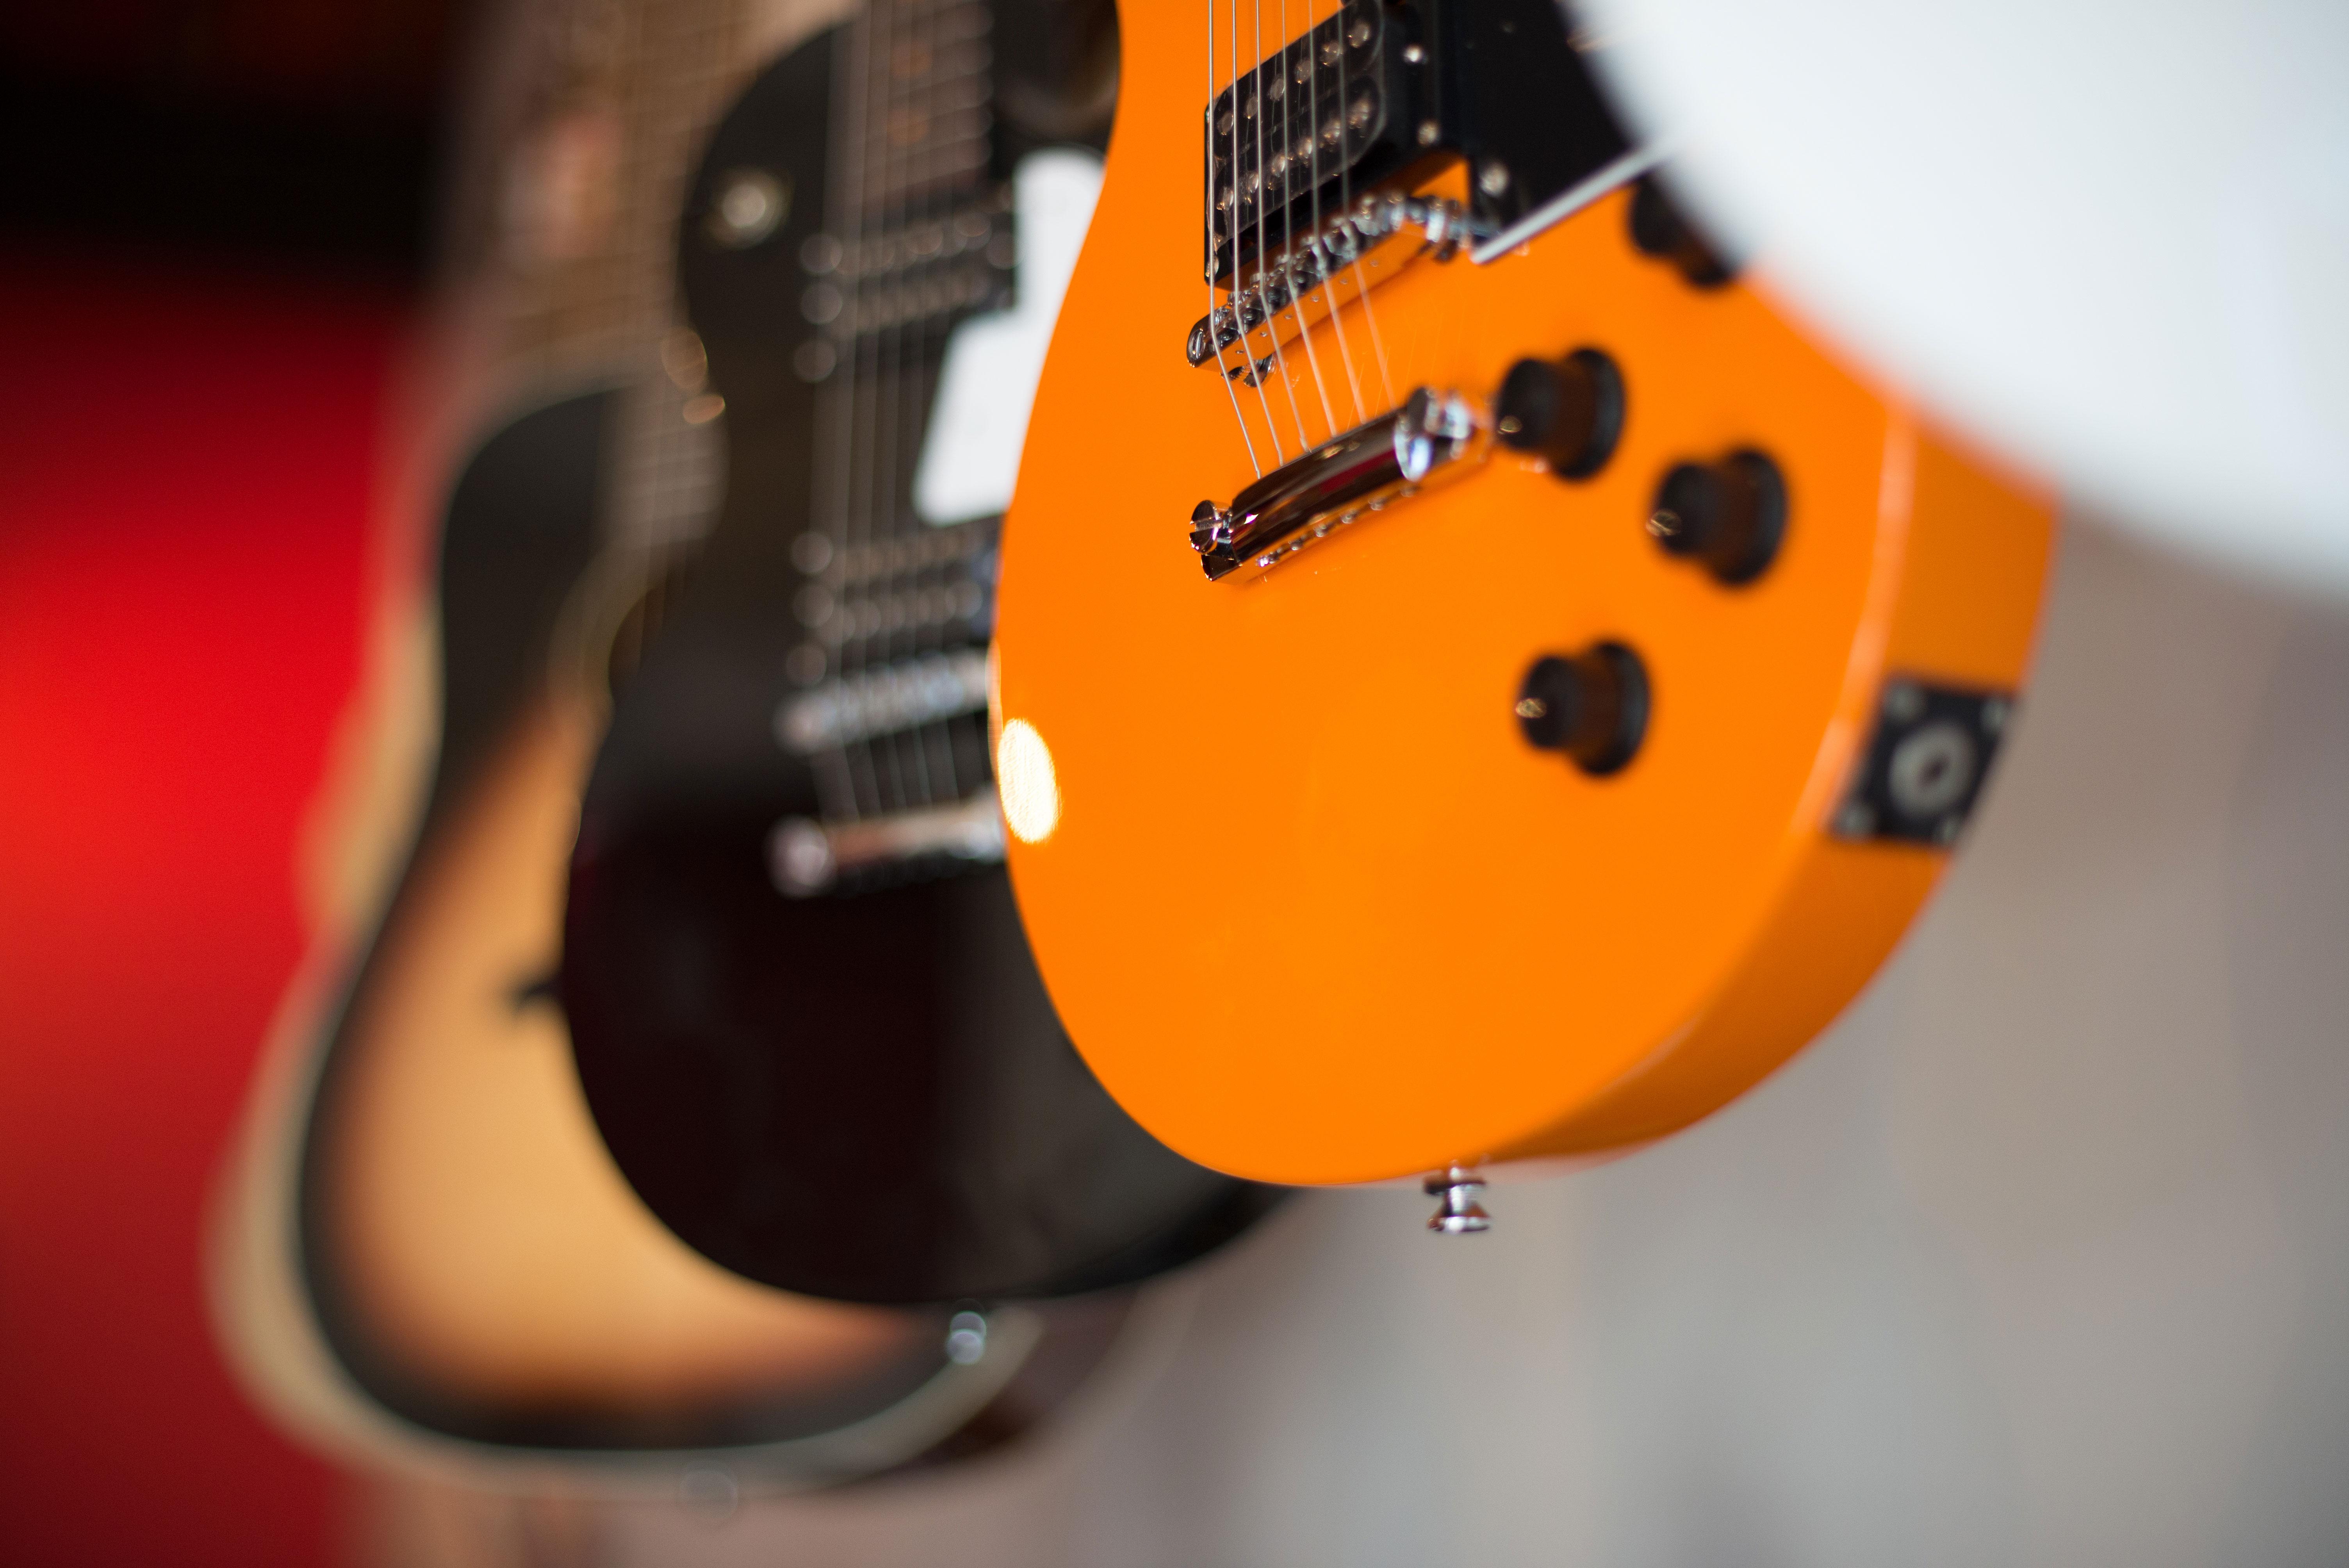 guitar lessons, piano lessons, voice lessons, drum lessons, violin lessons in birmingham, AL